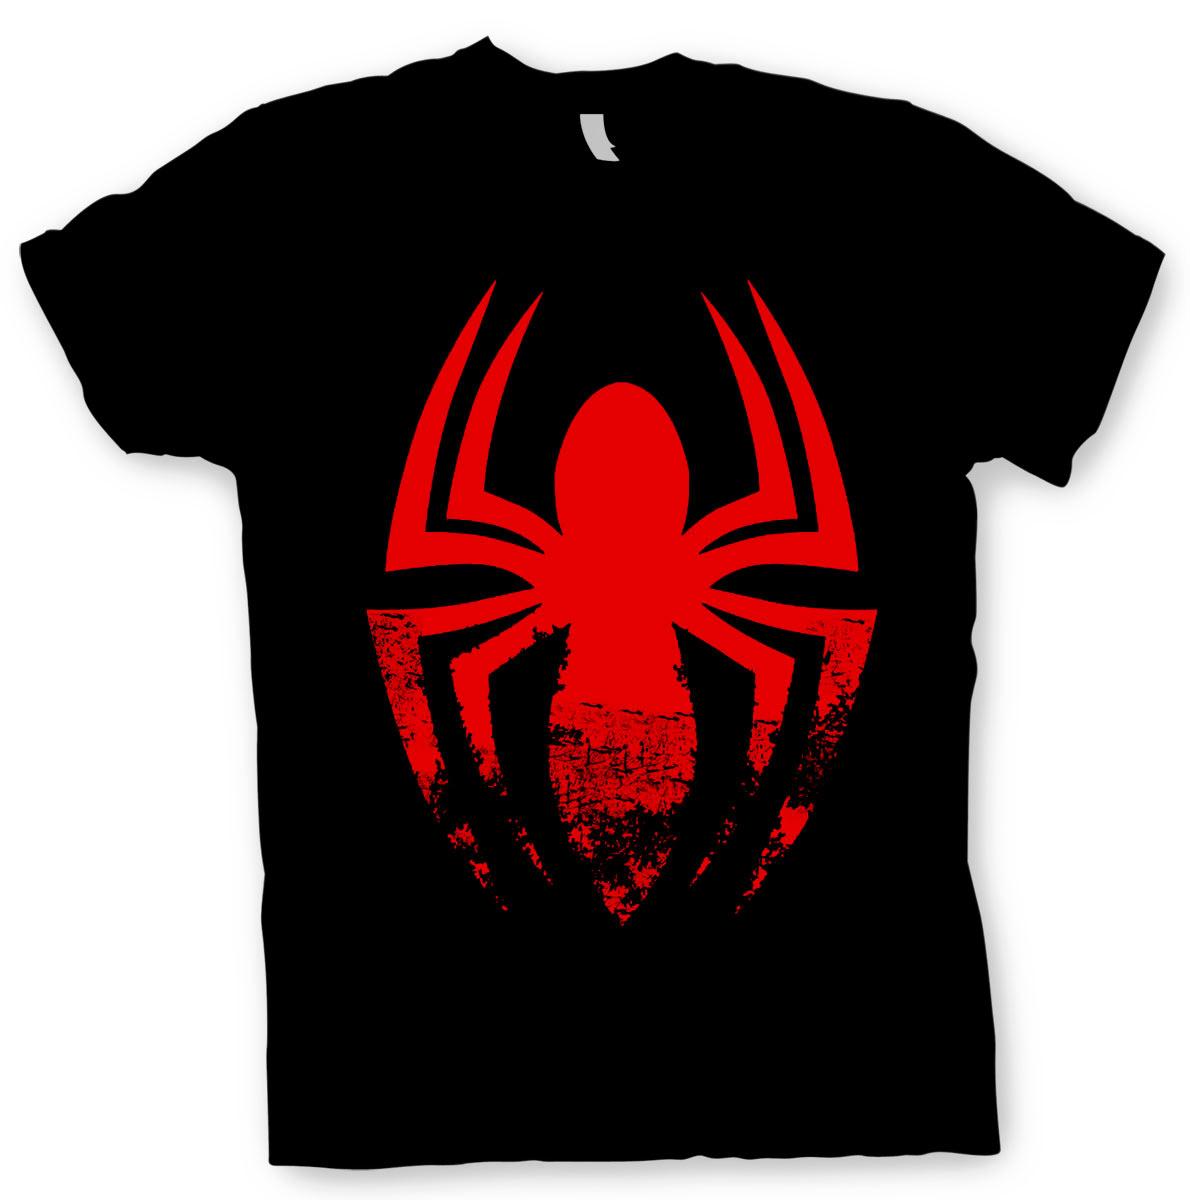 Camiseta Spiderman. Símbolo araña. Modelo negra